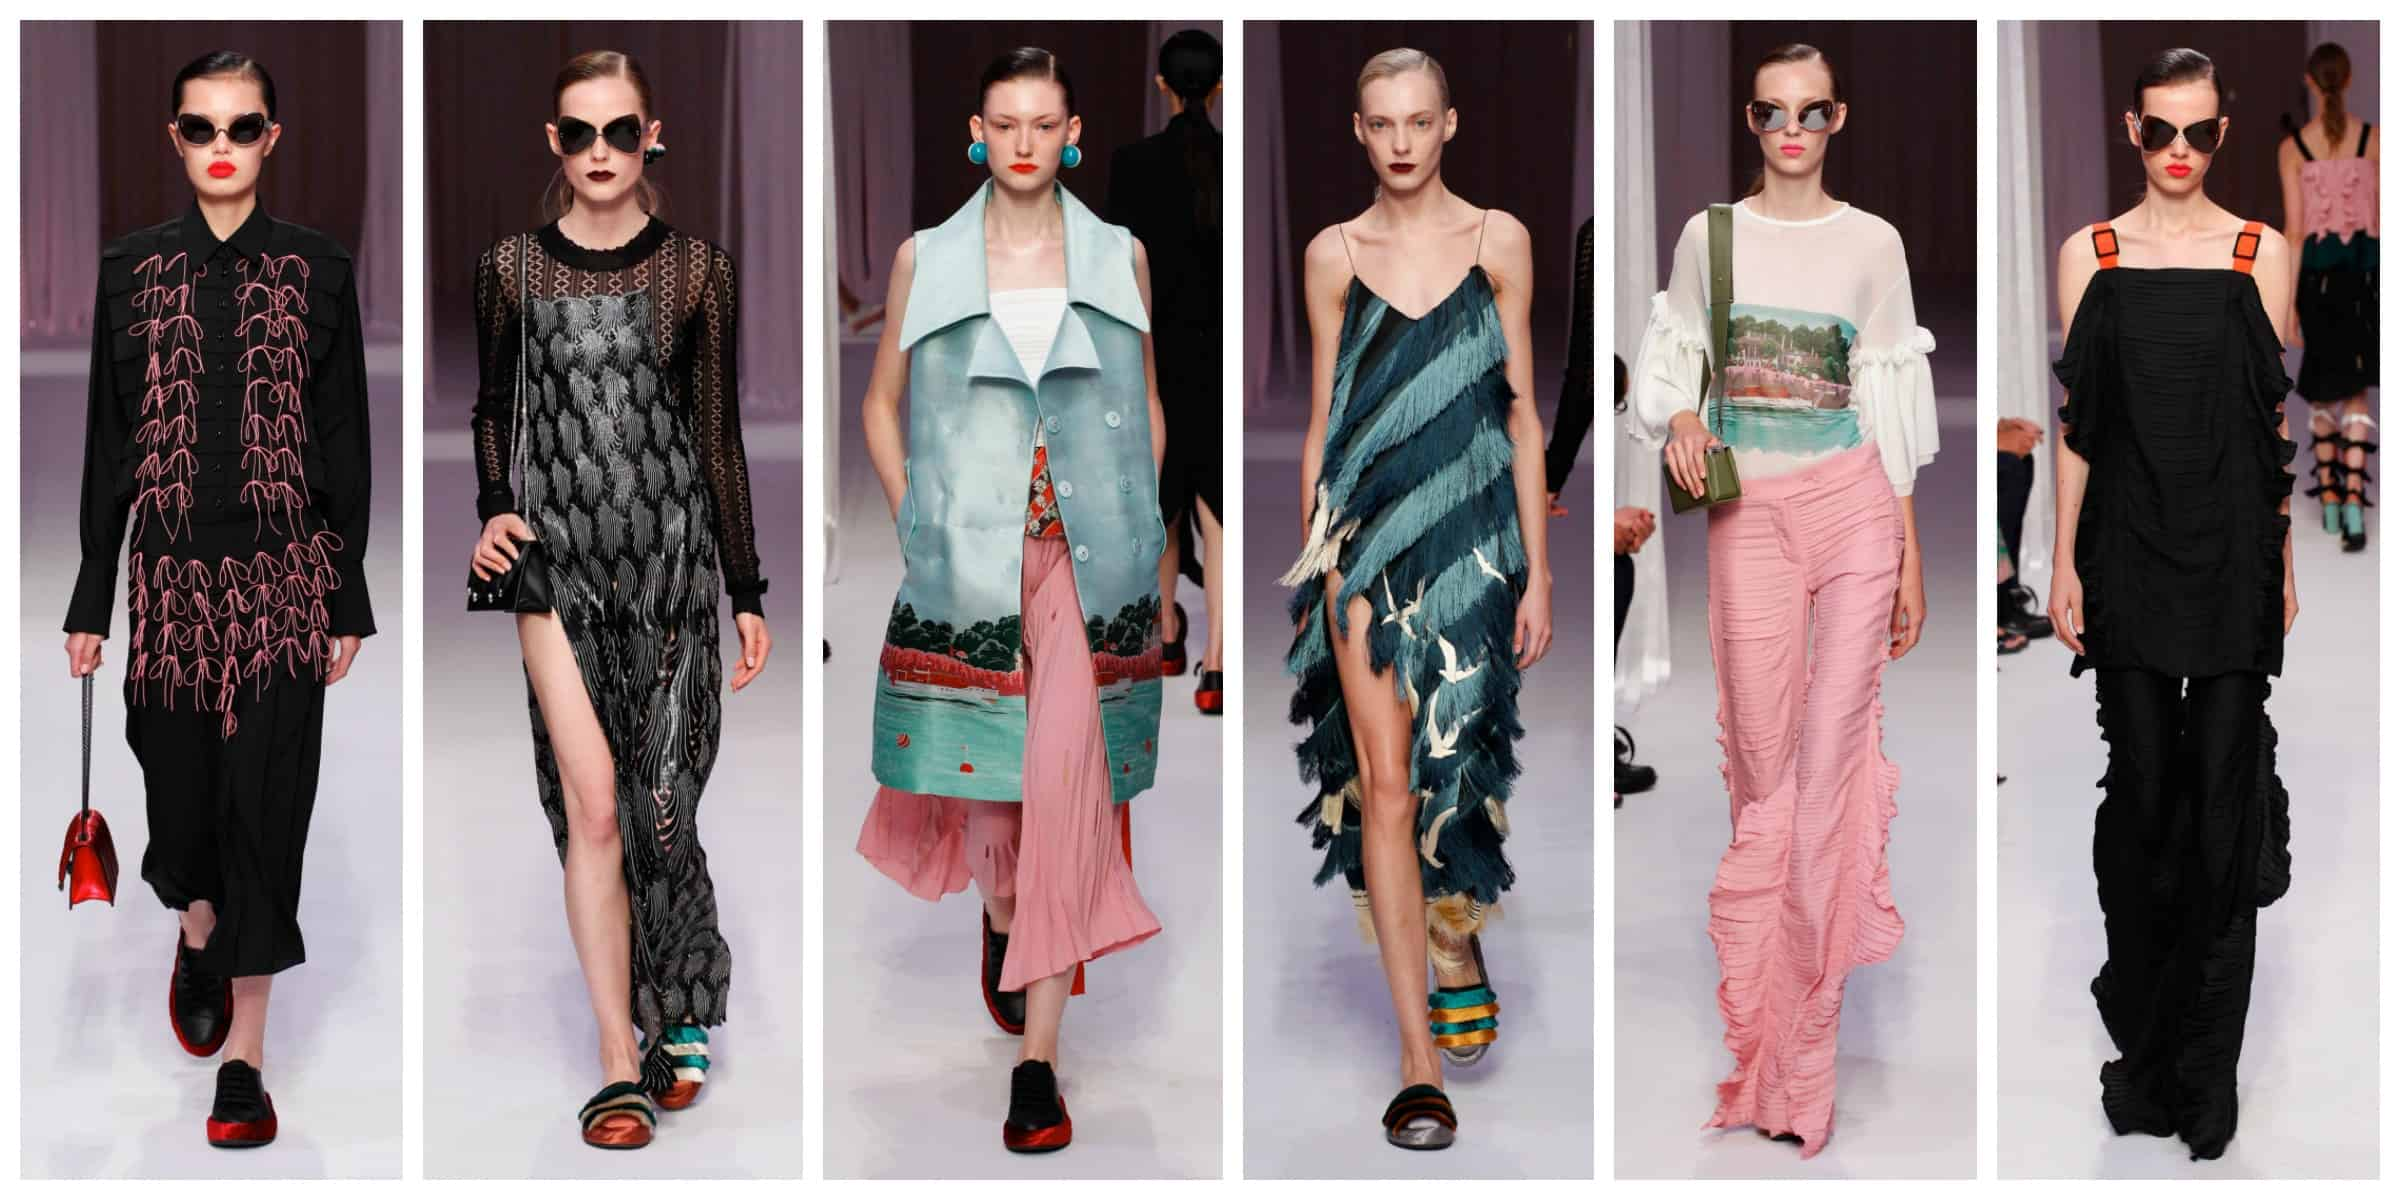 Marco De Vincenzo Milan Fashion Week Spring 2017 The Fashion Tag Blog